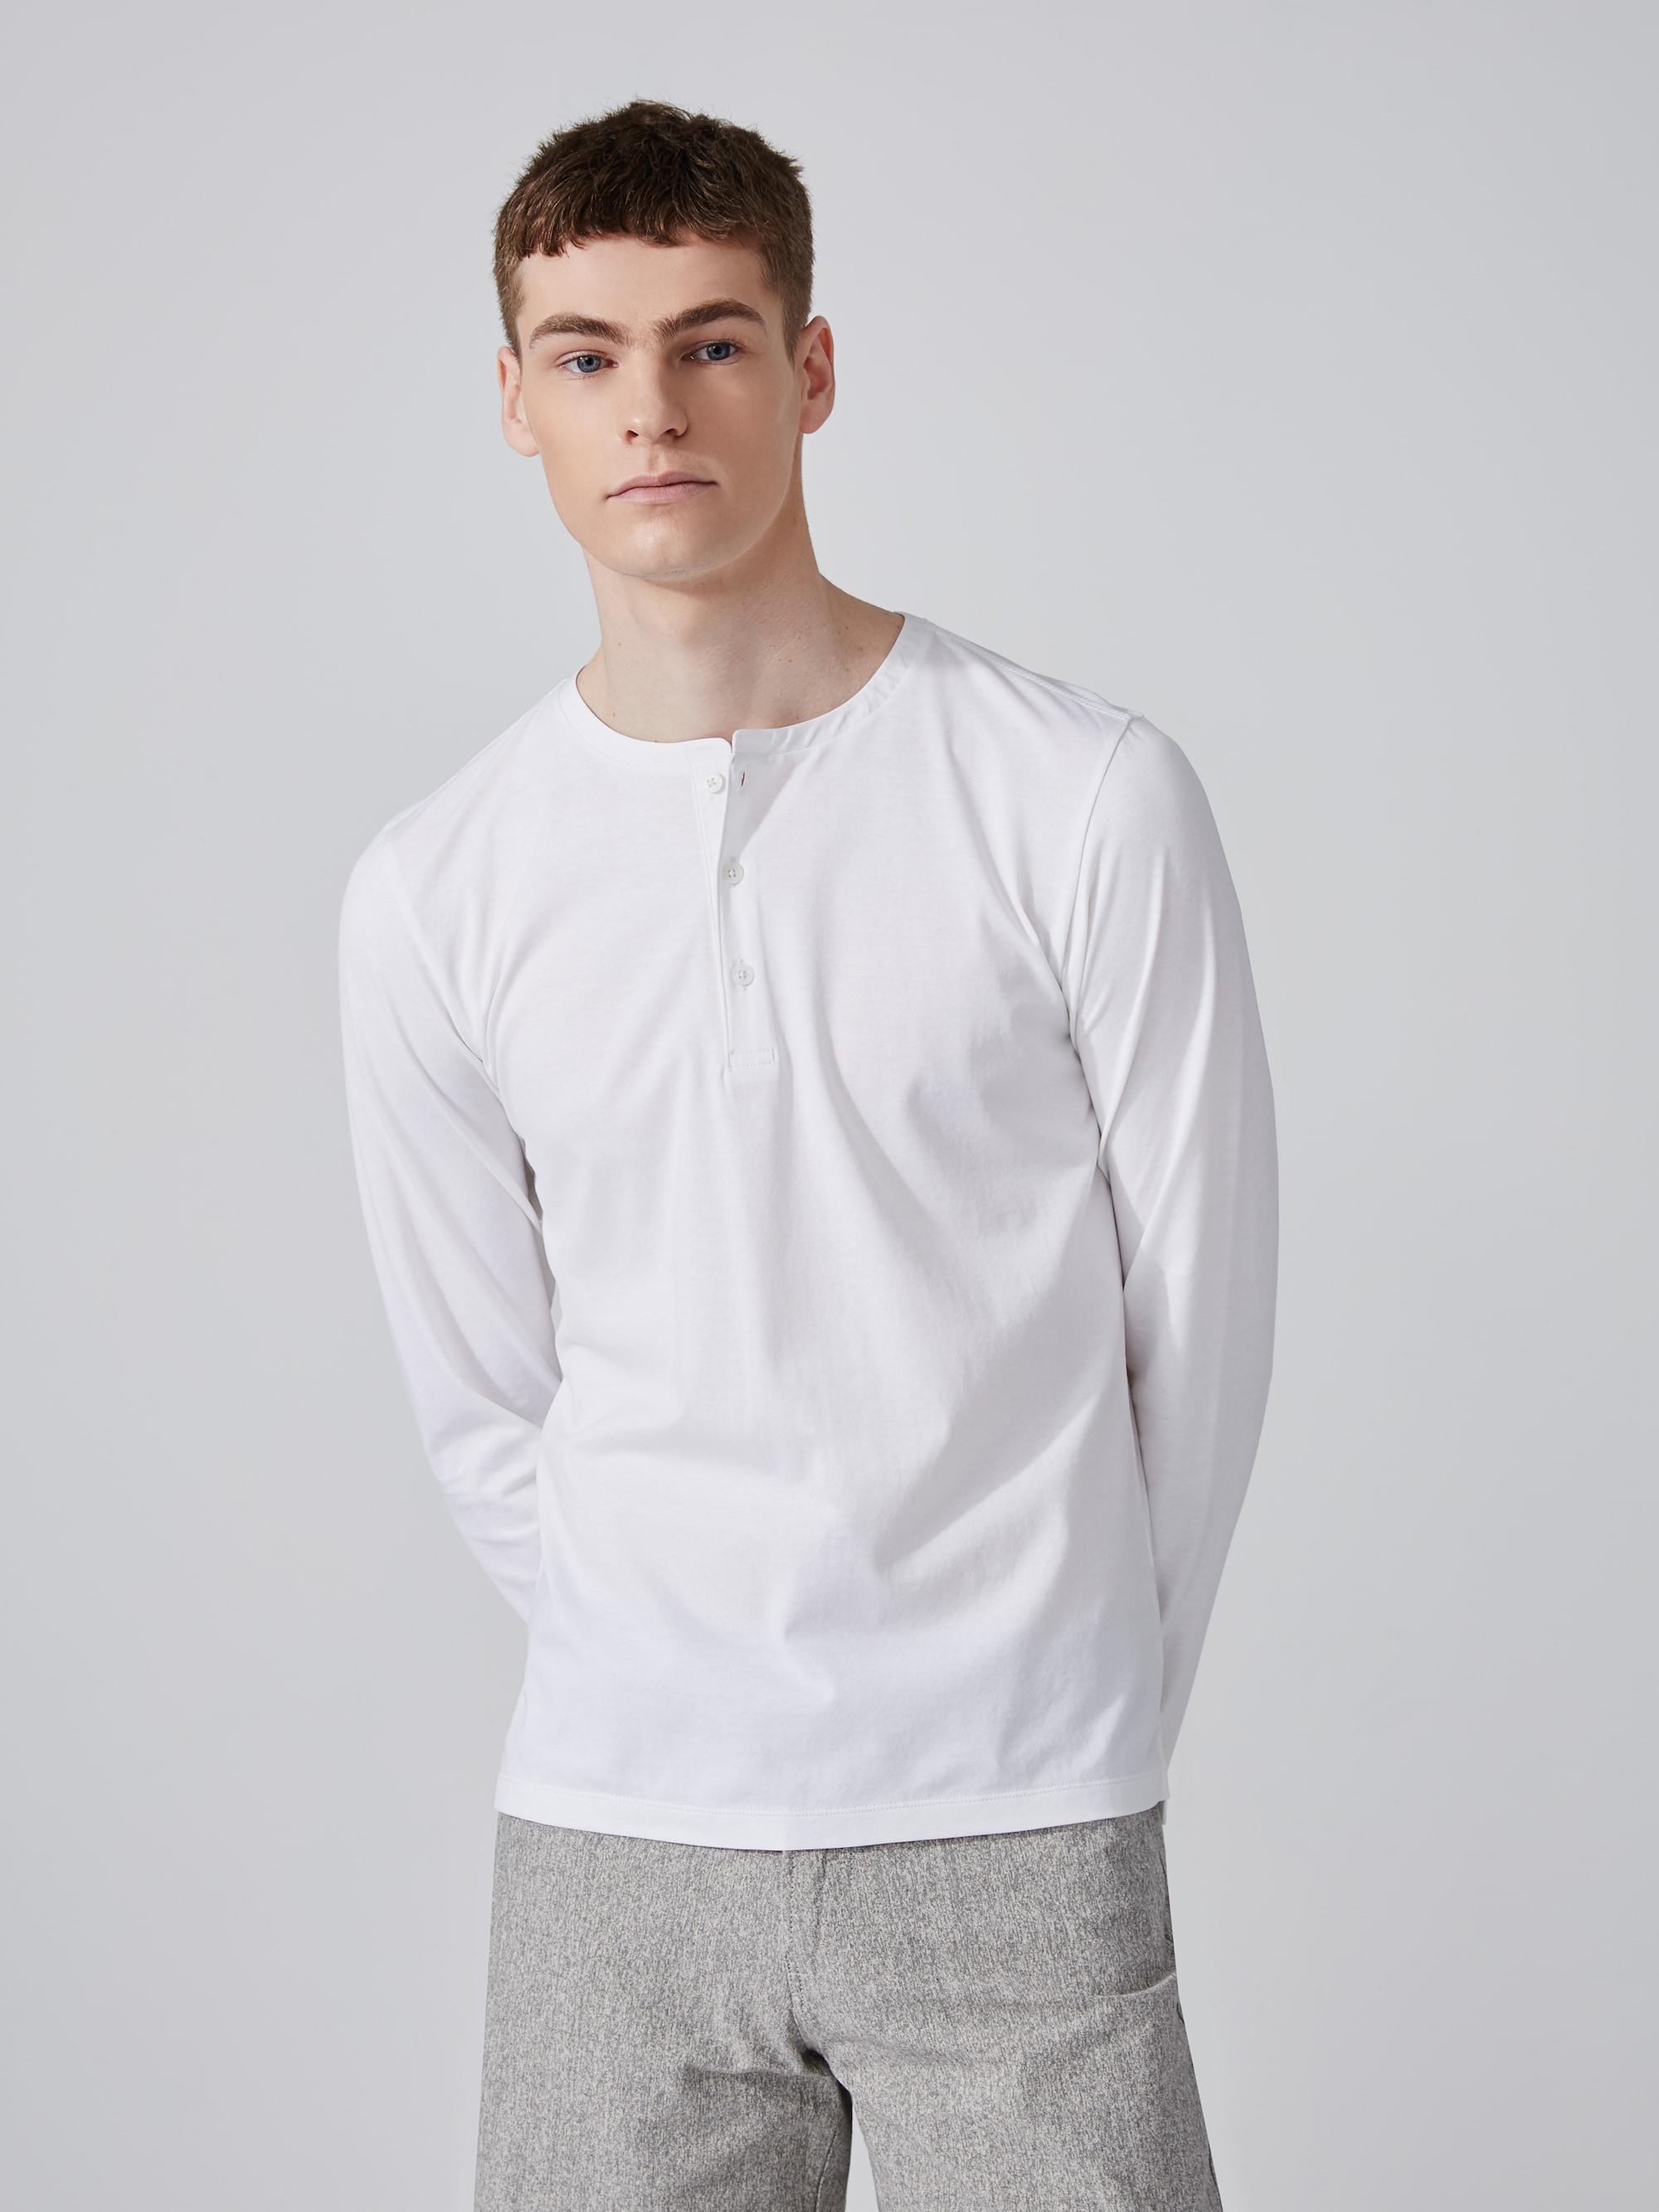 Frank oak easy wear cotton henley in bright white in for Frank and oak shirt